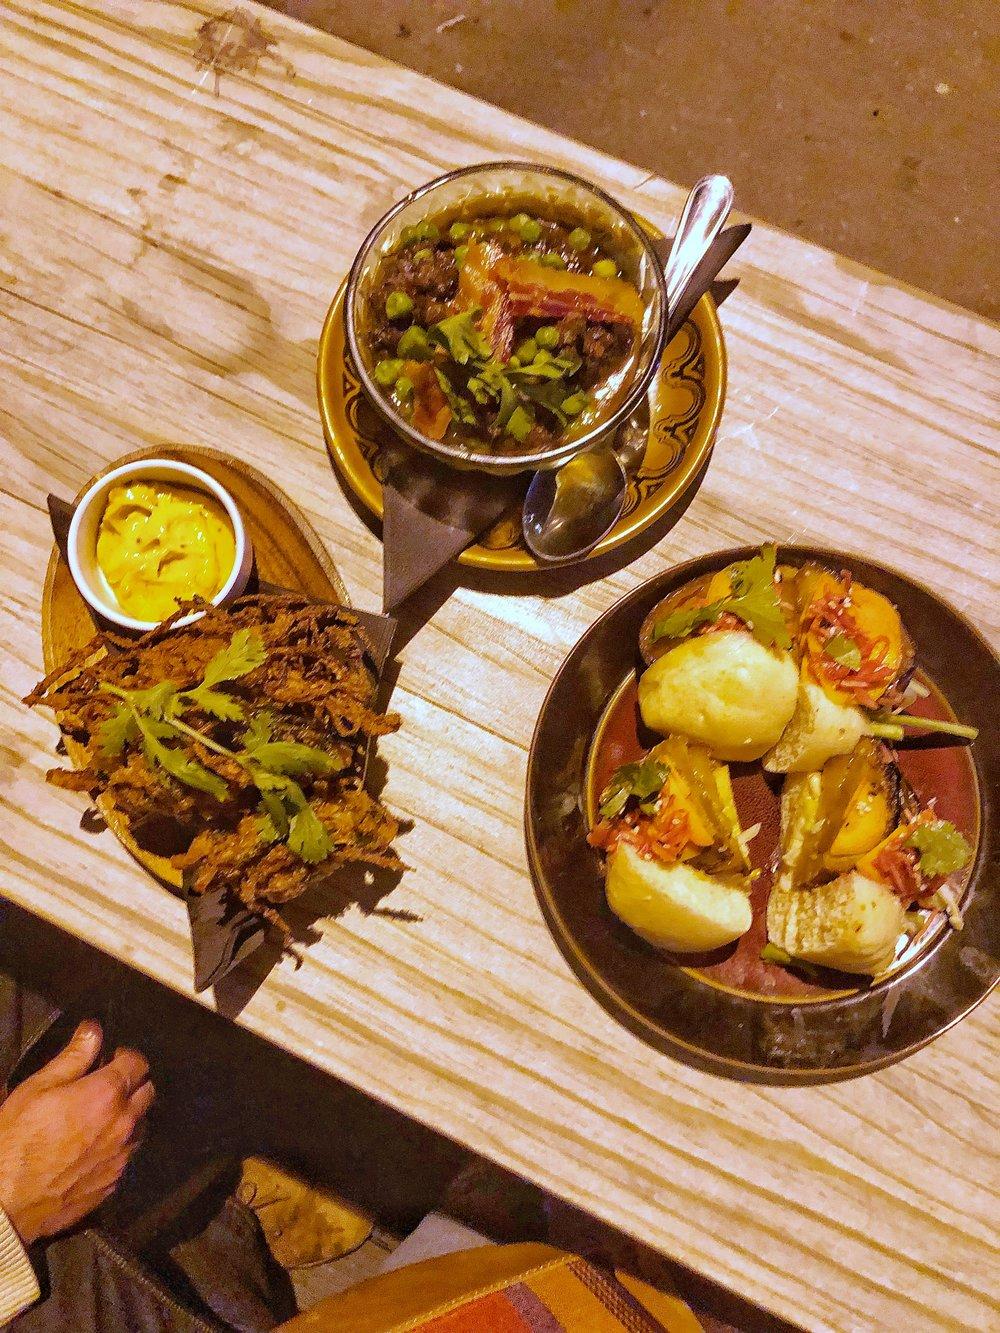 Onion bhajis and atcha mayo, braised springbok with peas and crispy bacon over potato mash, steamed bao with pickled eggplant and tahini sauce